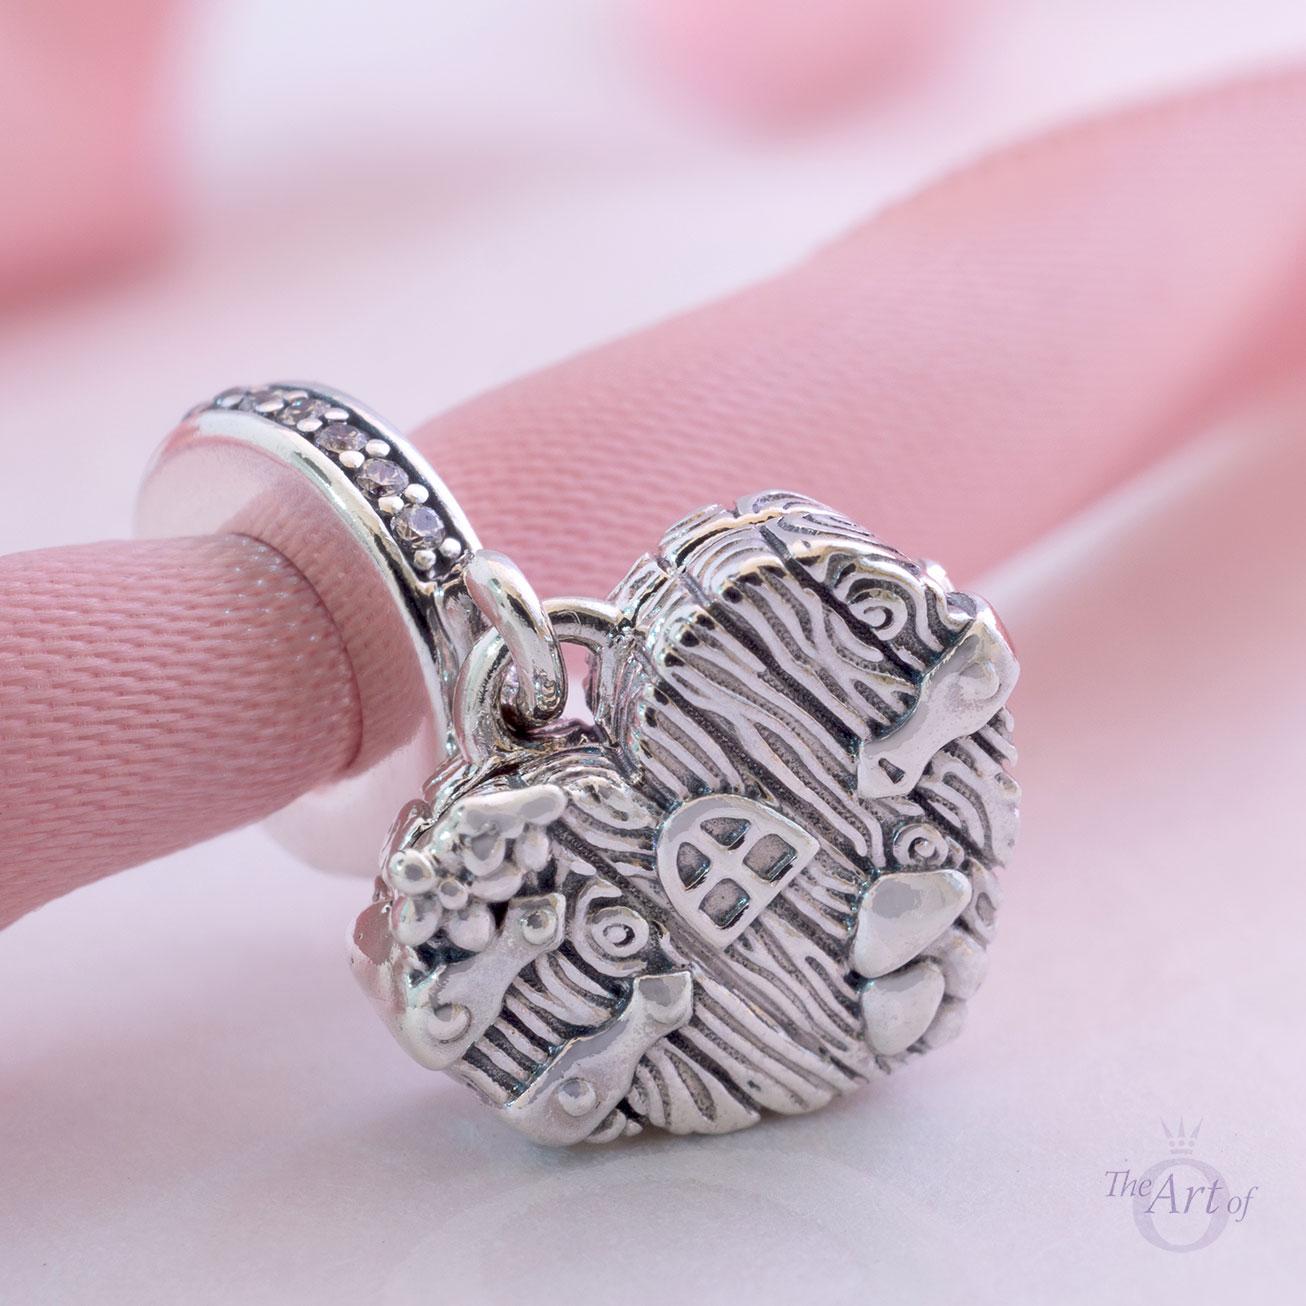 Review Pandora Home Sweet Heart Pendant Charm The Art Of Pandora More Than Just A Pandora Blog